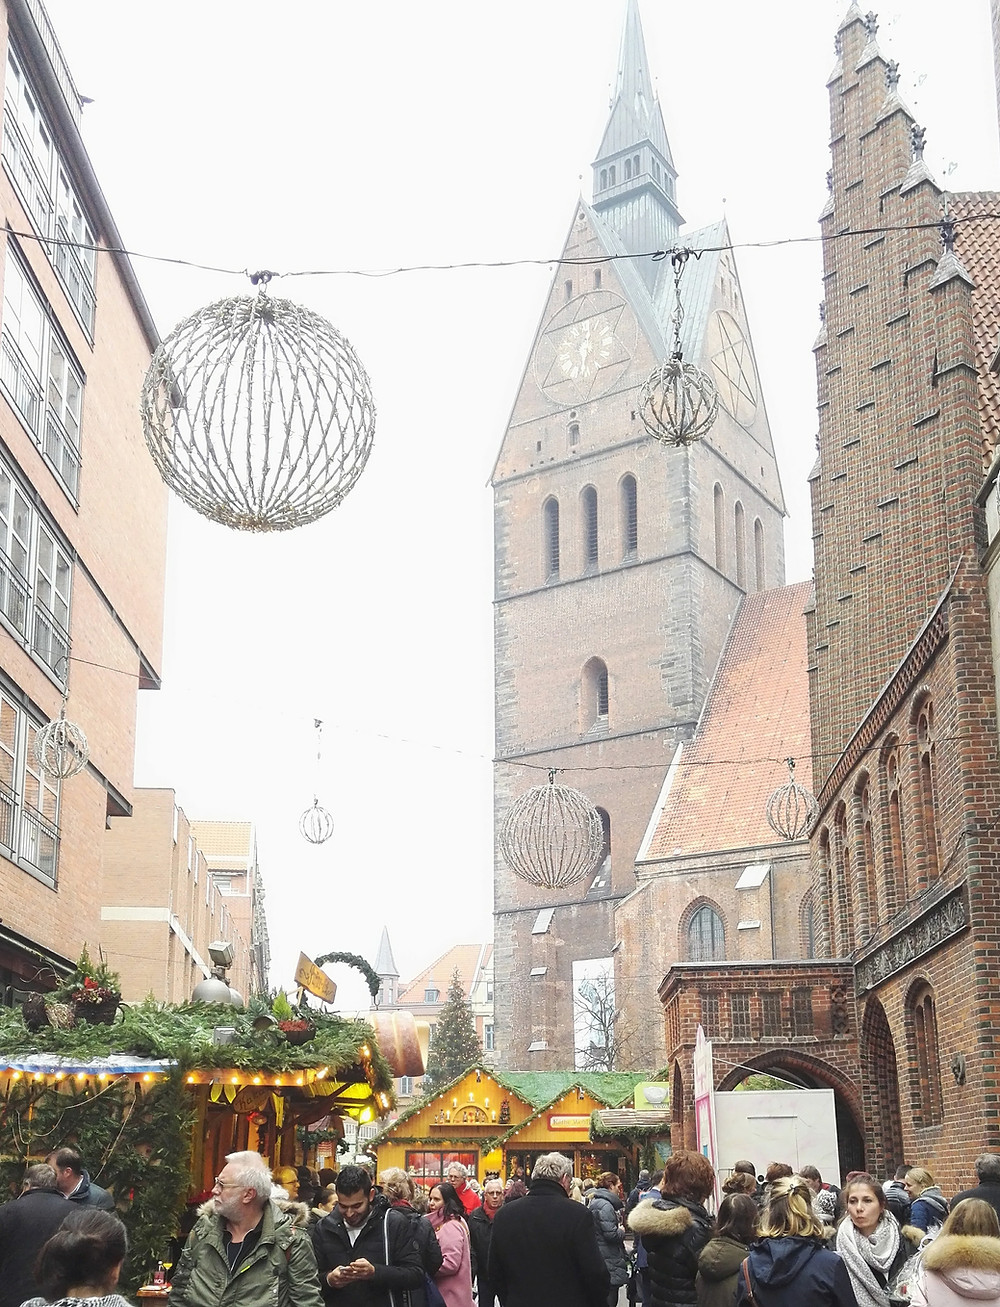 Mercats de nadal alemanya mercadillos de navidad alemania 16